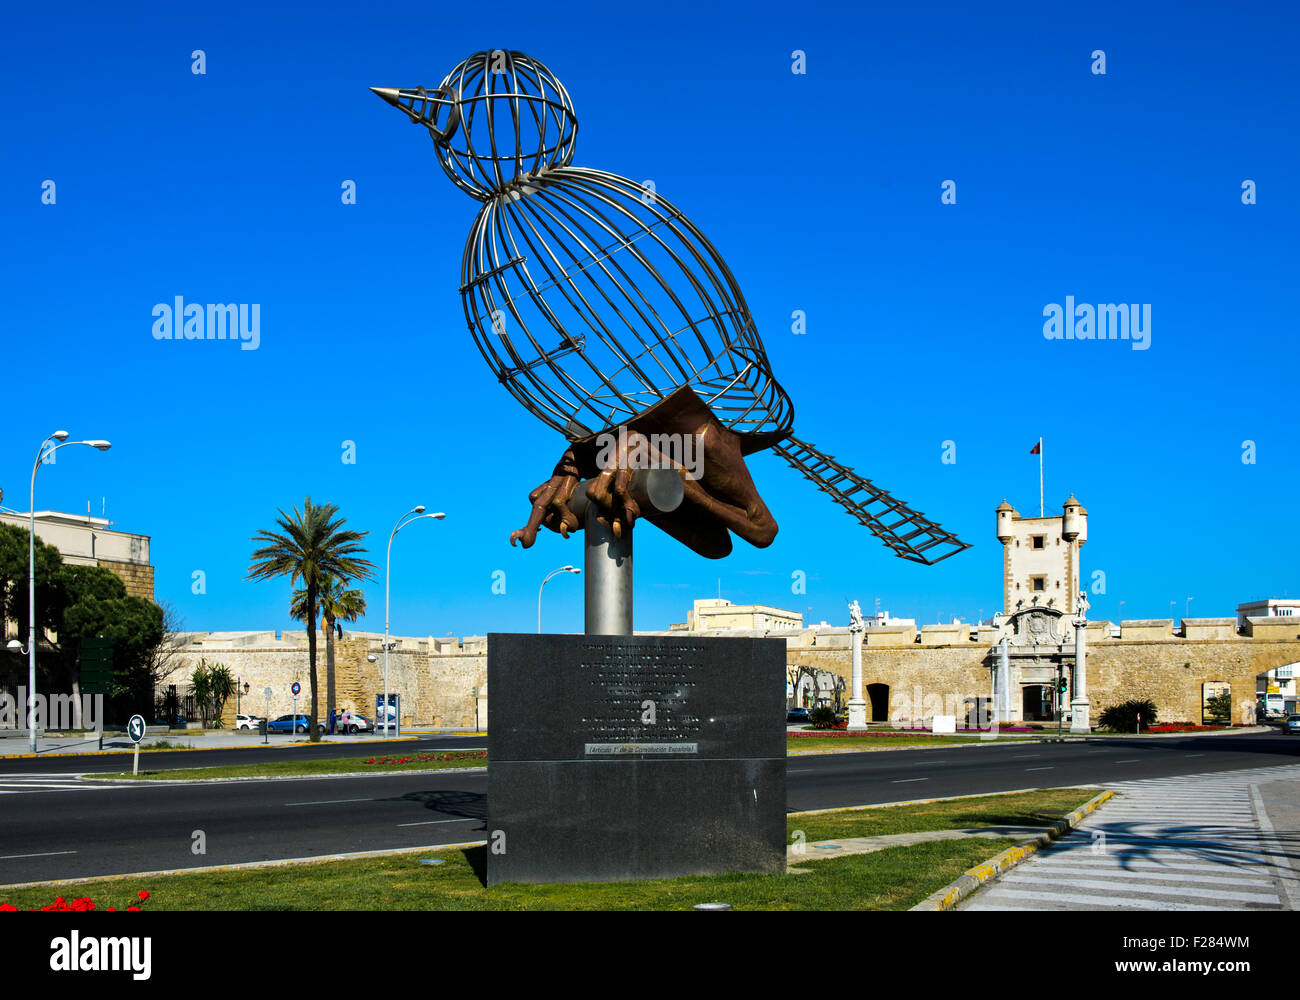 Sculpture Bird in Cage, Pájaro-Jaula, by Luis Quintero, Plaza de la Constitucion, Cádiz, Andalusia, Spain - Stock Image